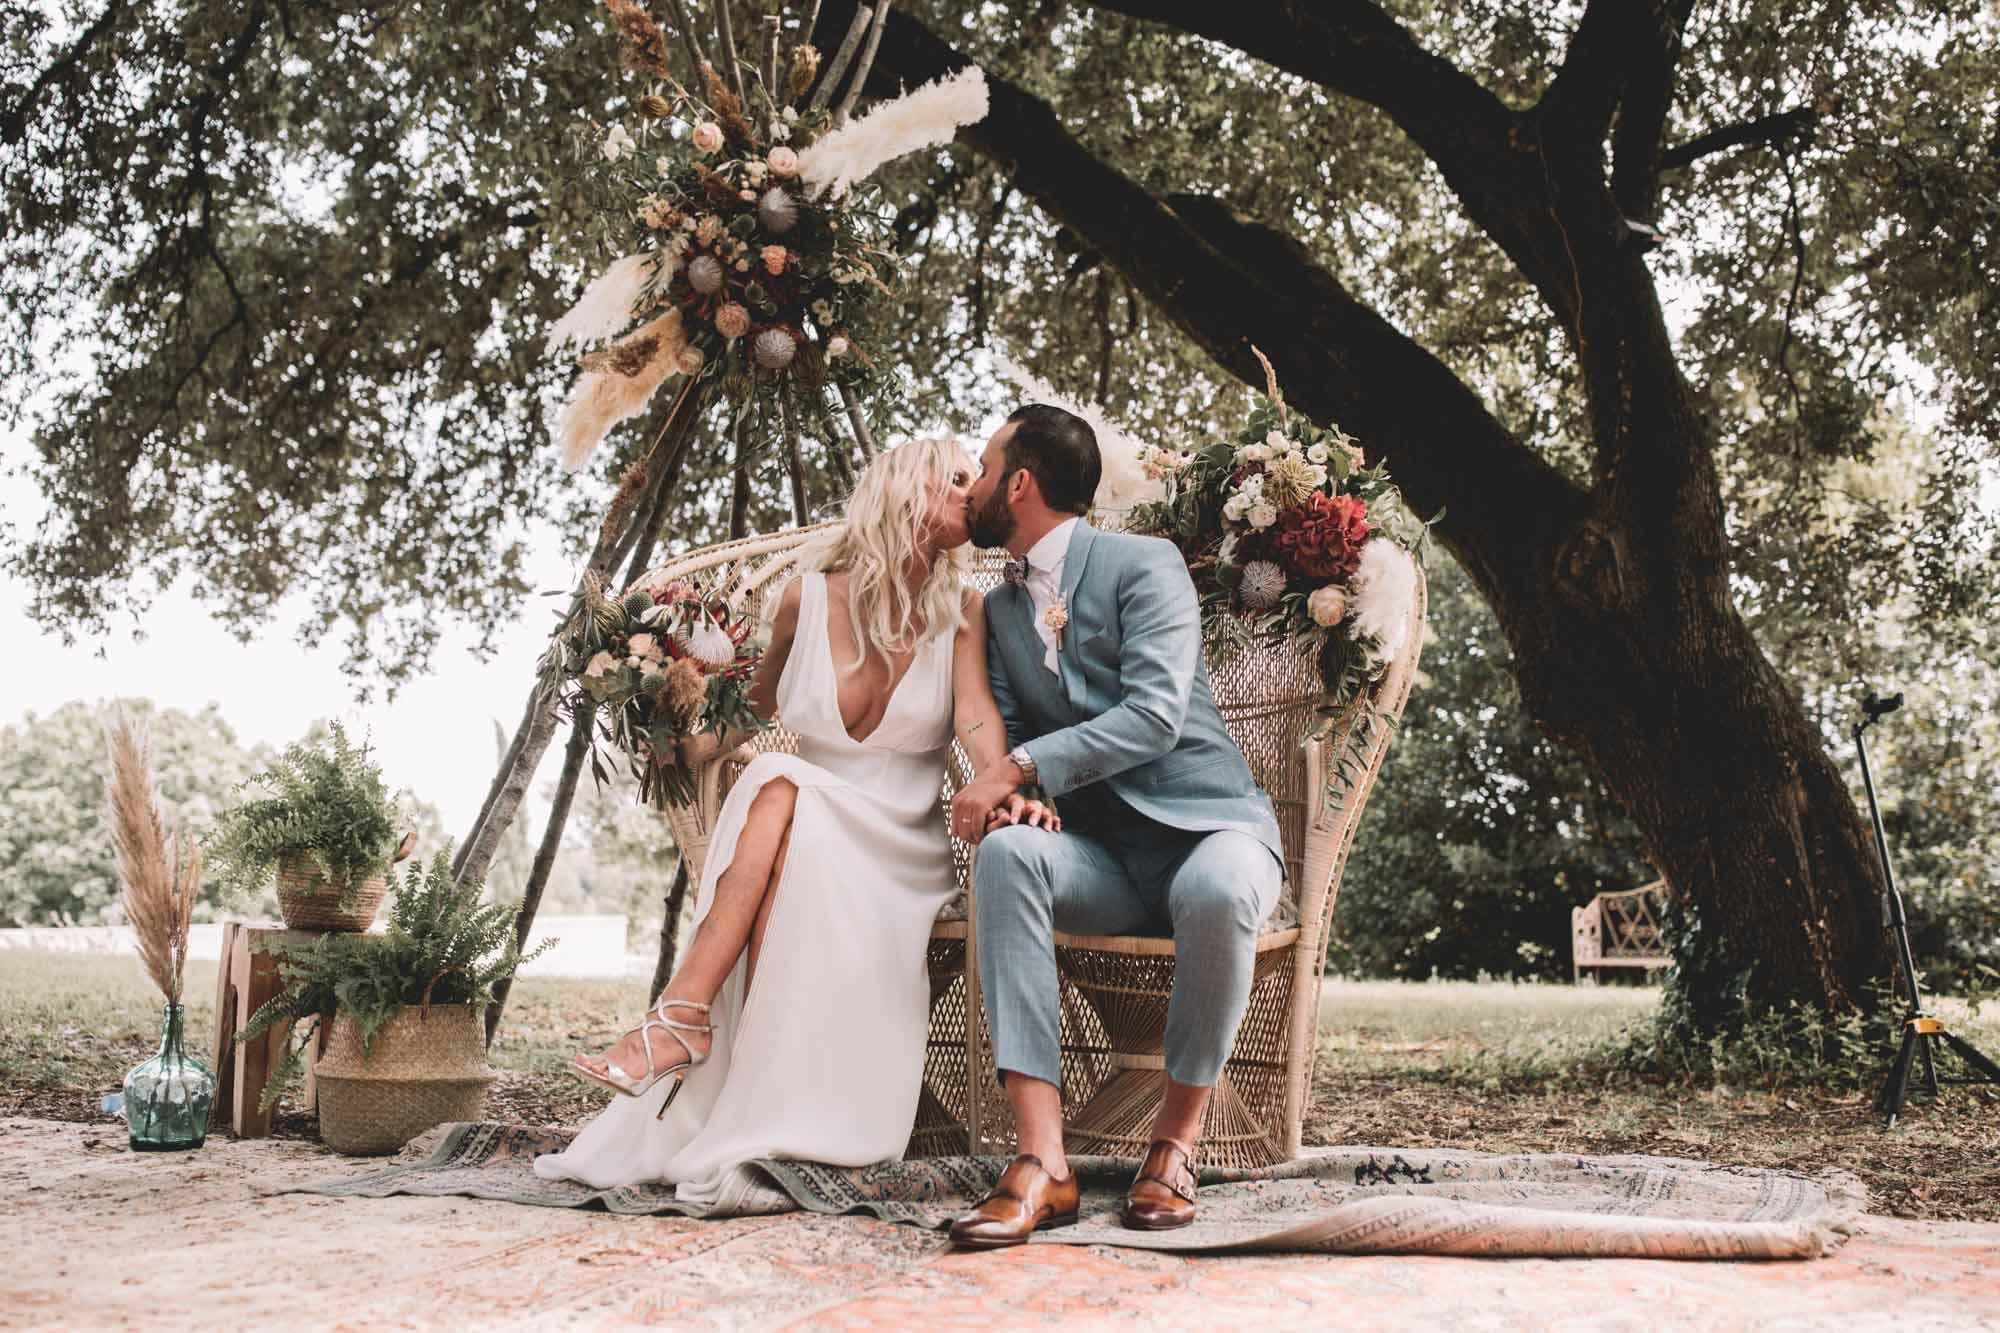 SANDDY + SIMON_DOMAINE DE PATRAS_PHOTOGRAPHE_MARIAGE_LES BANDITS-3